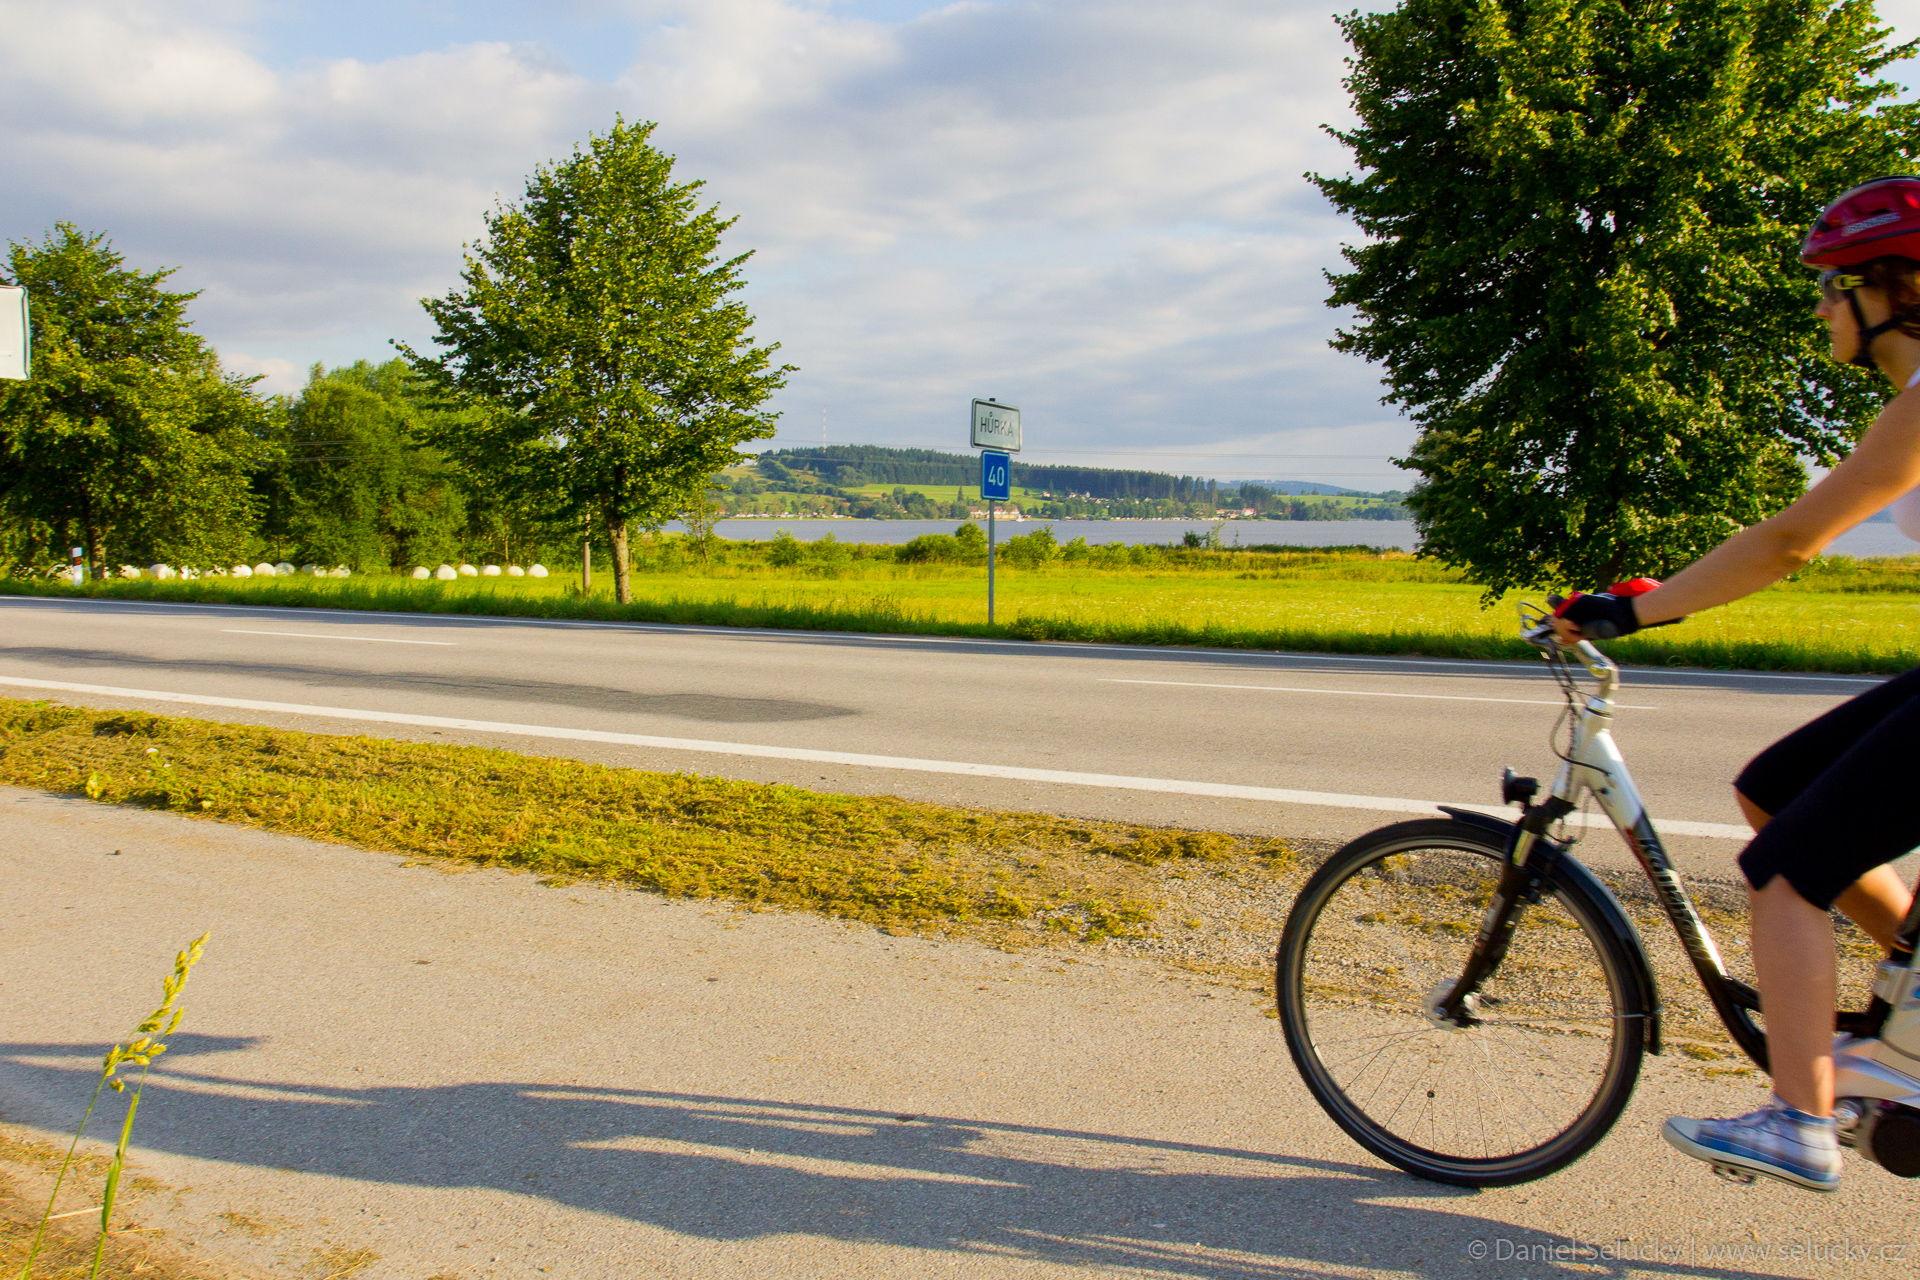 Cyklostezka u našeho penzionu